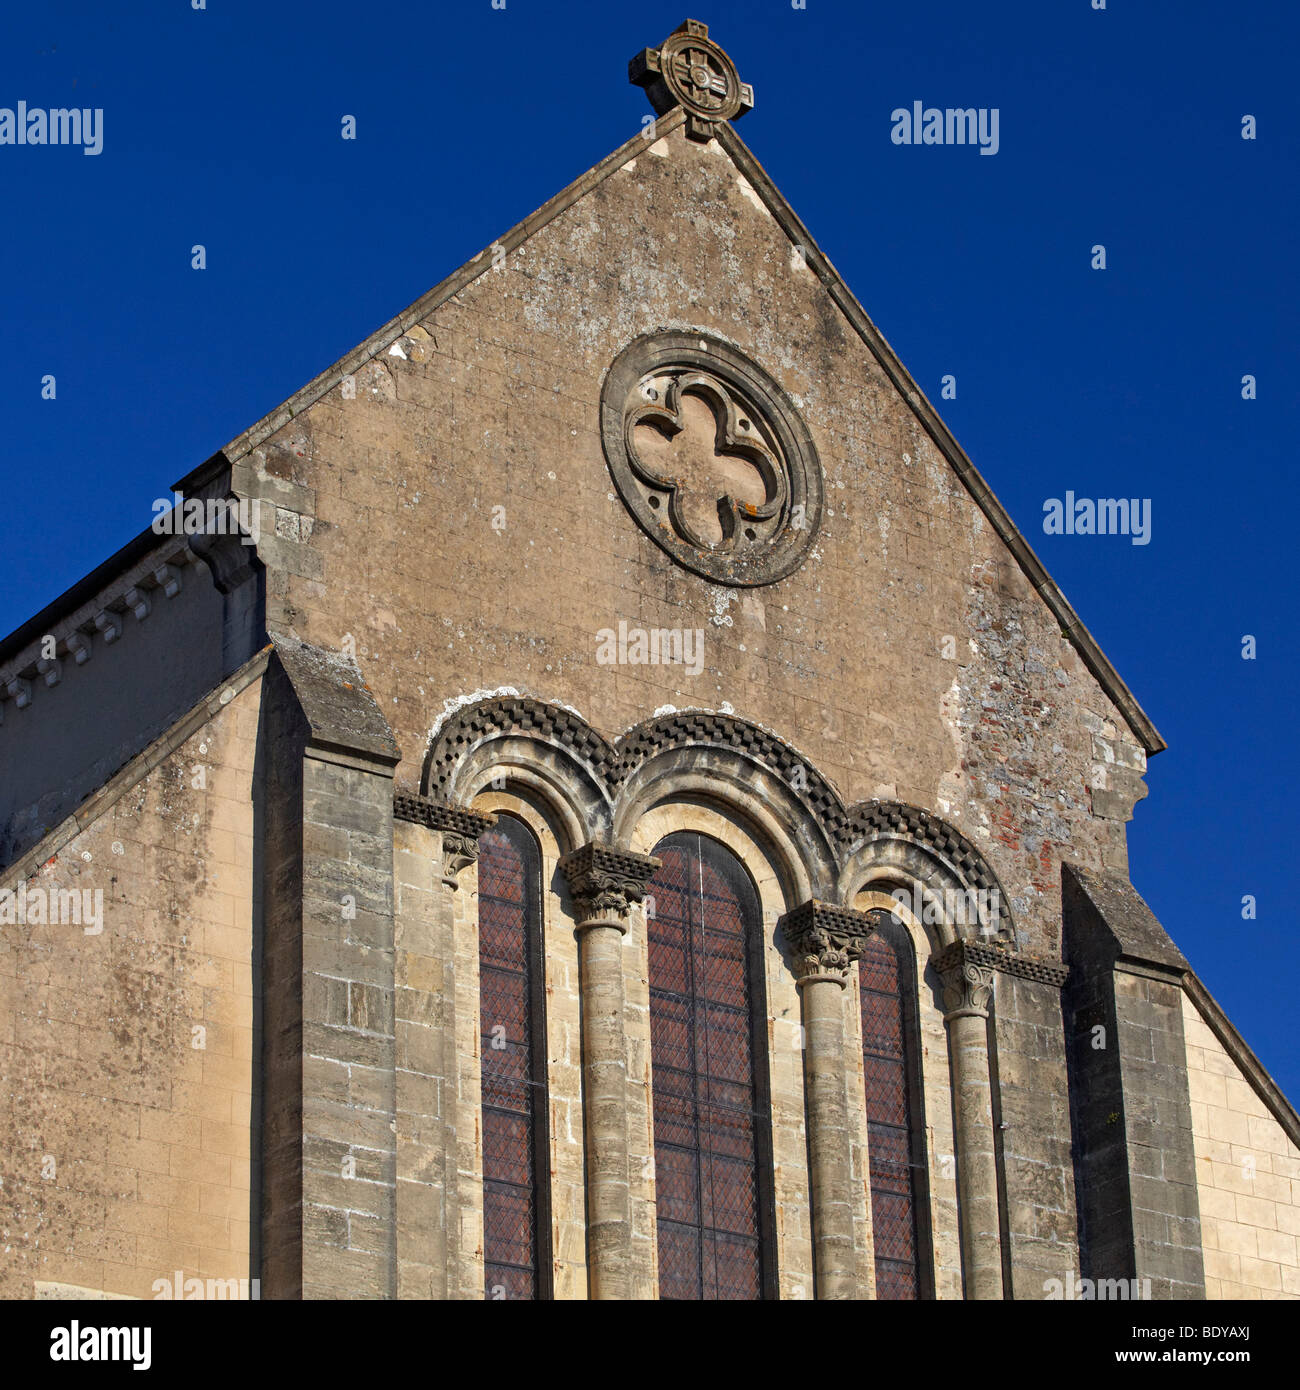 Abbaye Saint-Sever Saint-Sever, Landes, Aquitaine, South of France, France, Europe - Stock Image